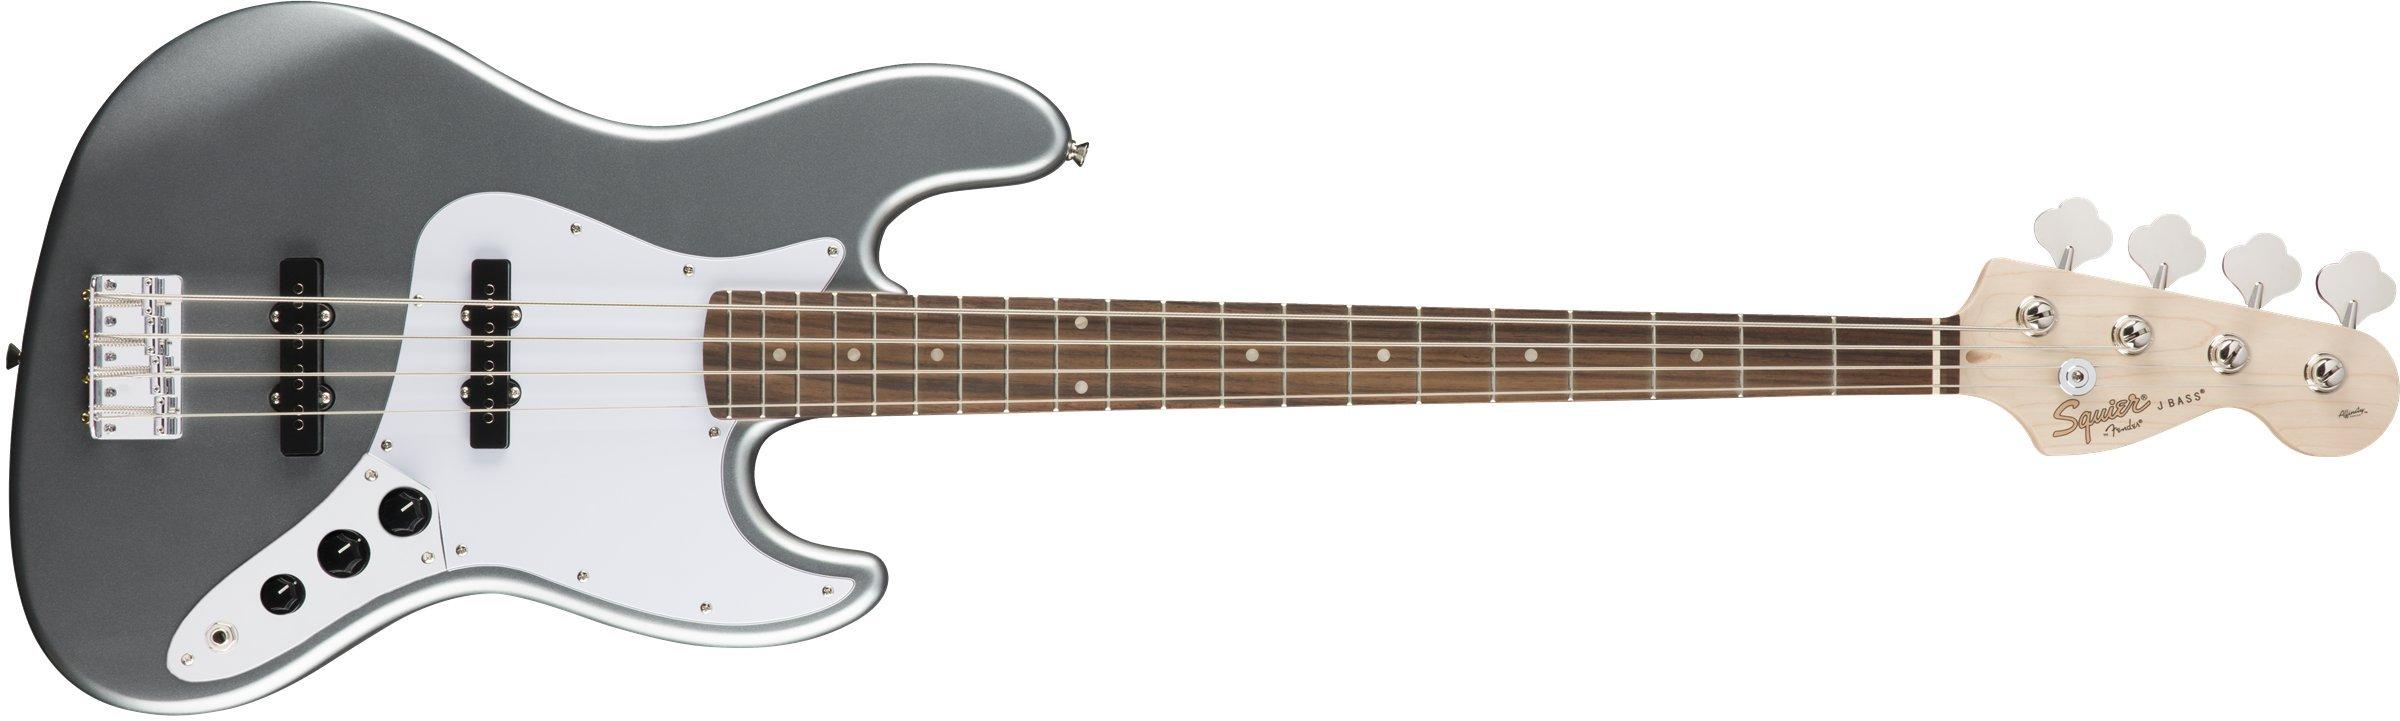 Squier by Fender Affinity Series Jazz Bass - Laurel Fingerboard - Slick Silver by Fender